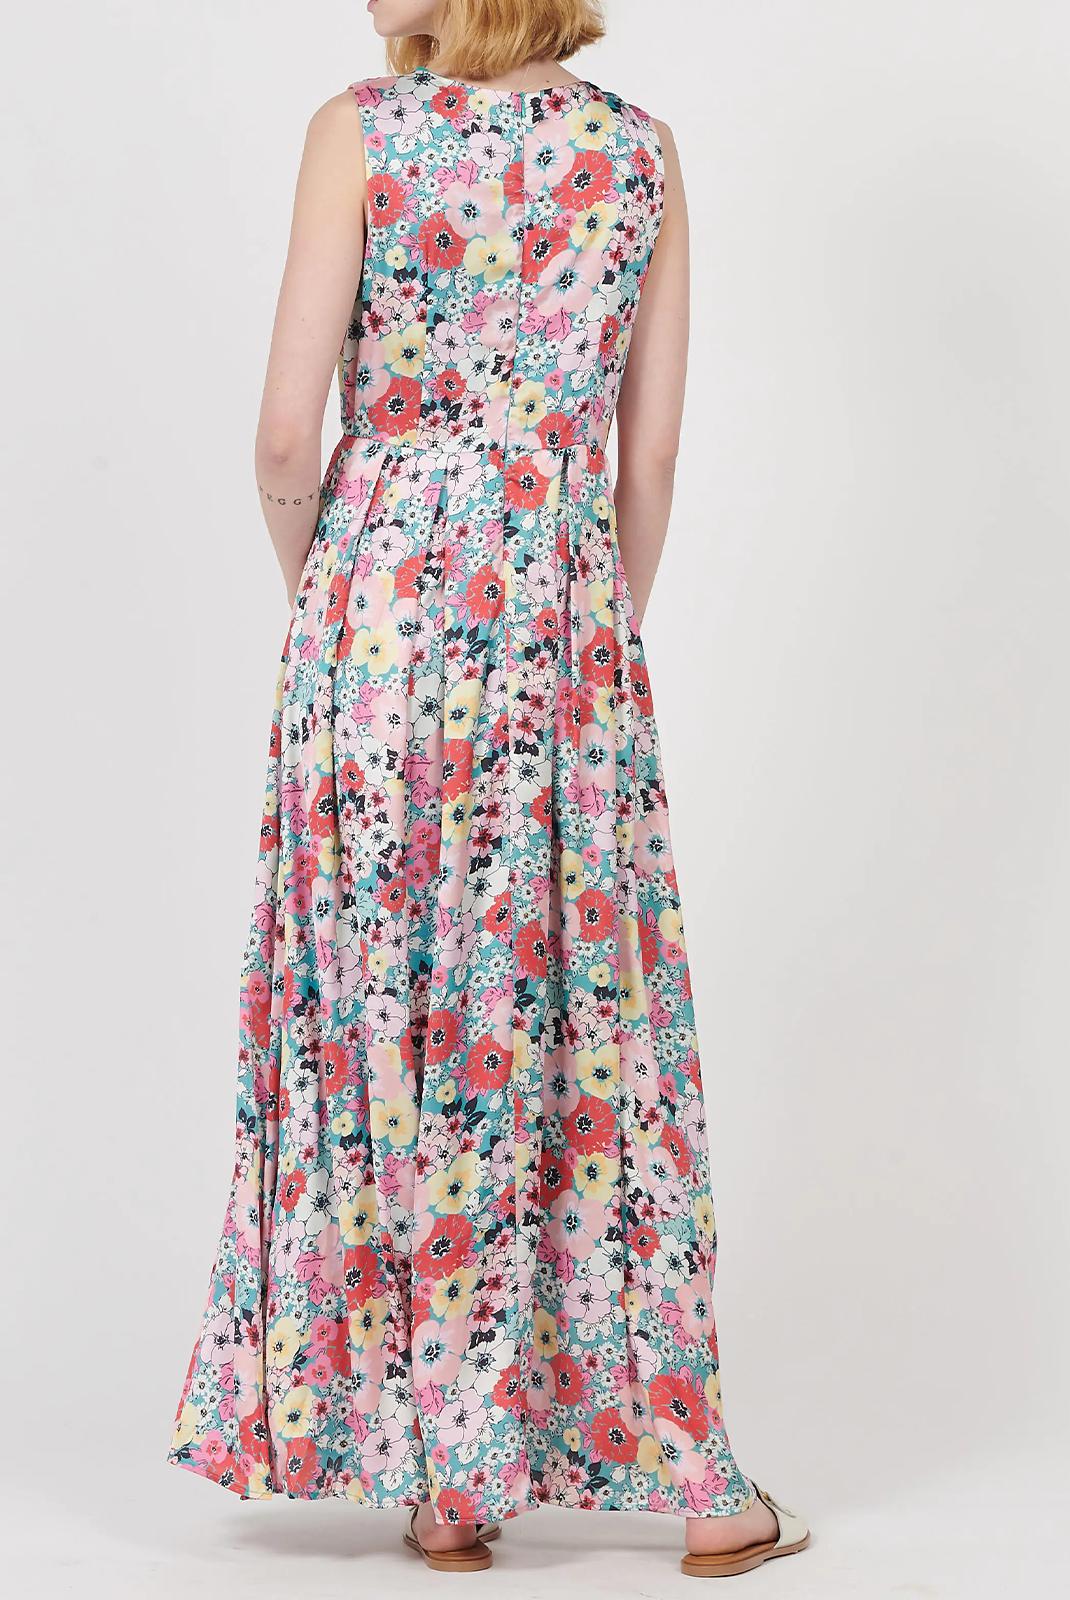 Robes  Molly bracken R1478BP20 GREEN